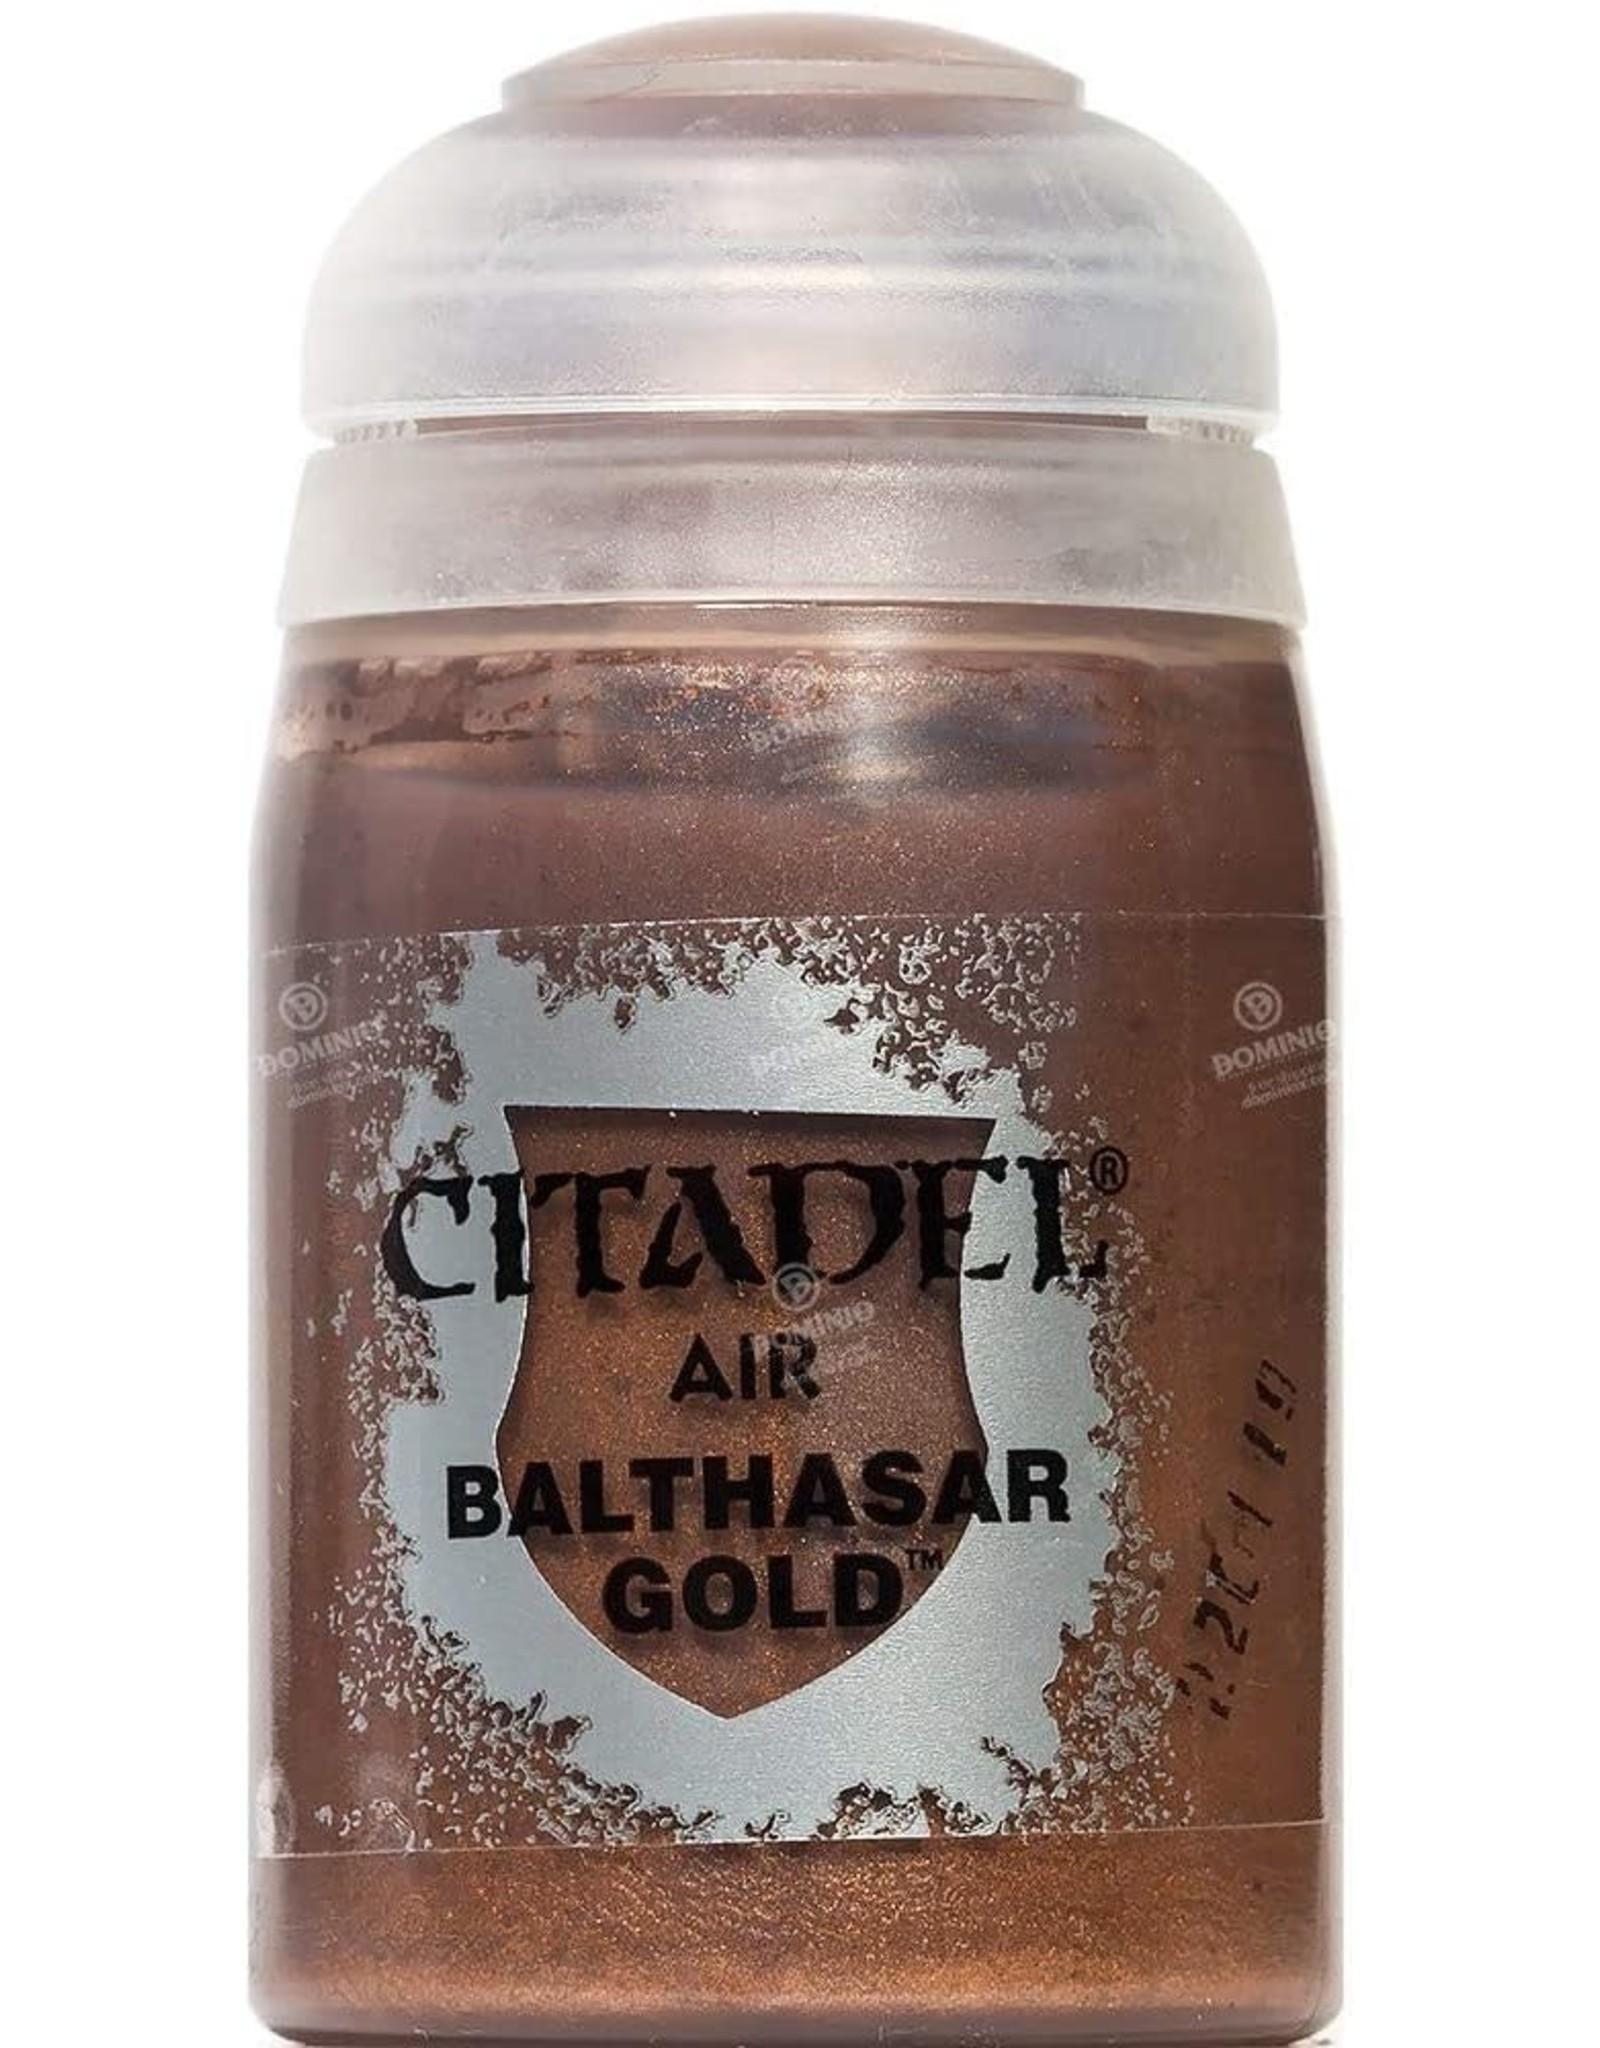 Games Workshop Citadel Paint: Balthasar Gold Air (24 ml)